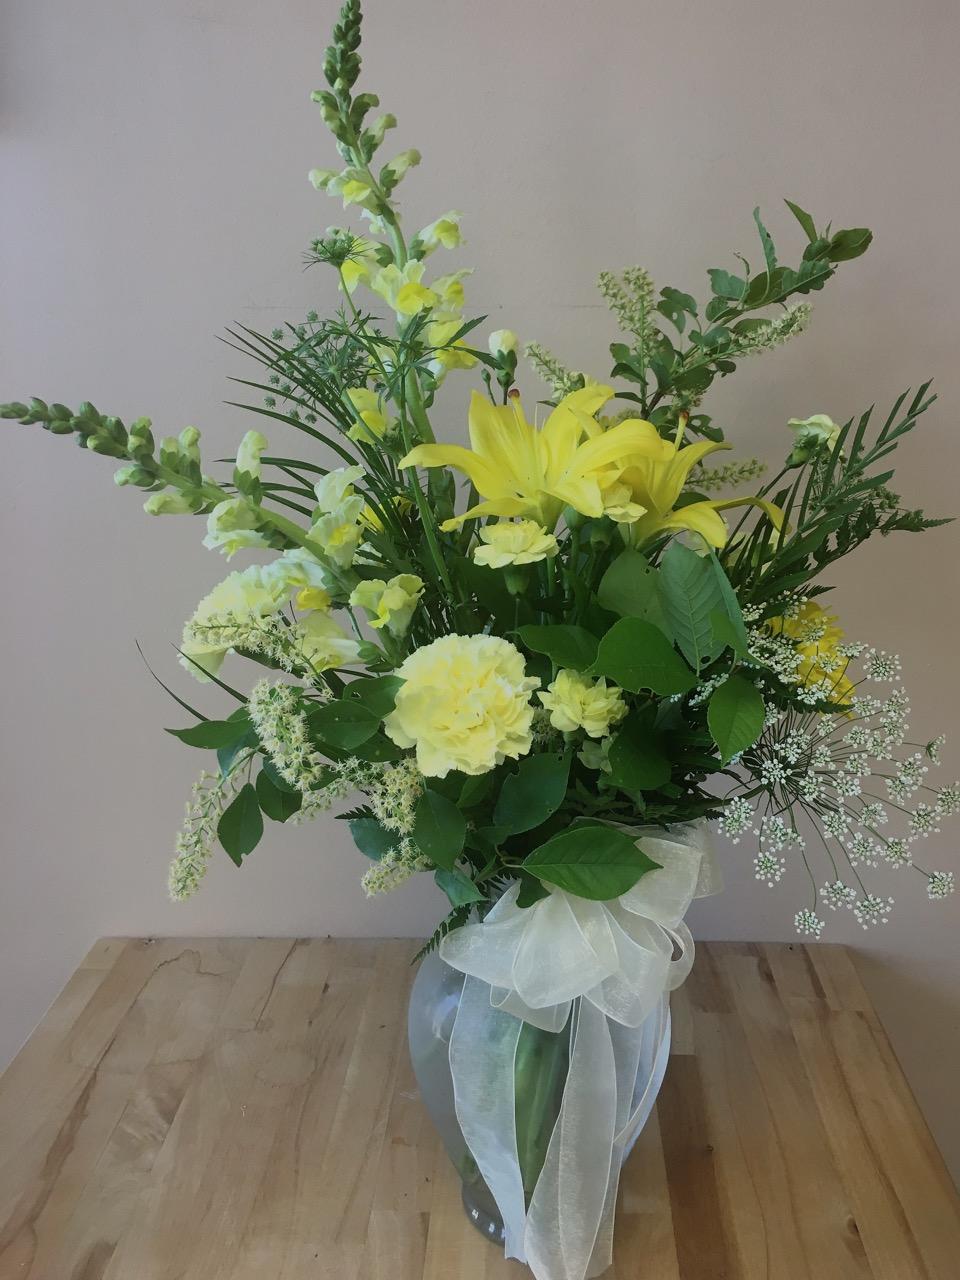 reba_garden_bouquets_spiritedtable_photo1.jpg